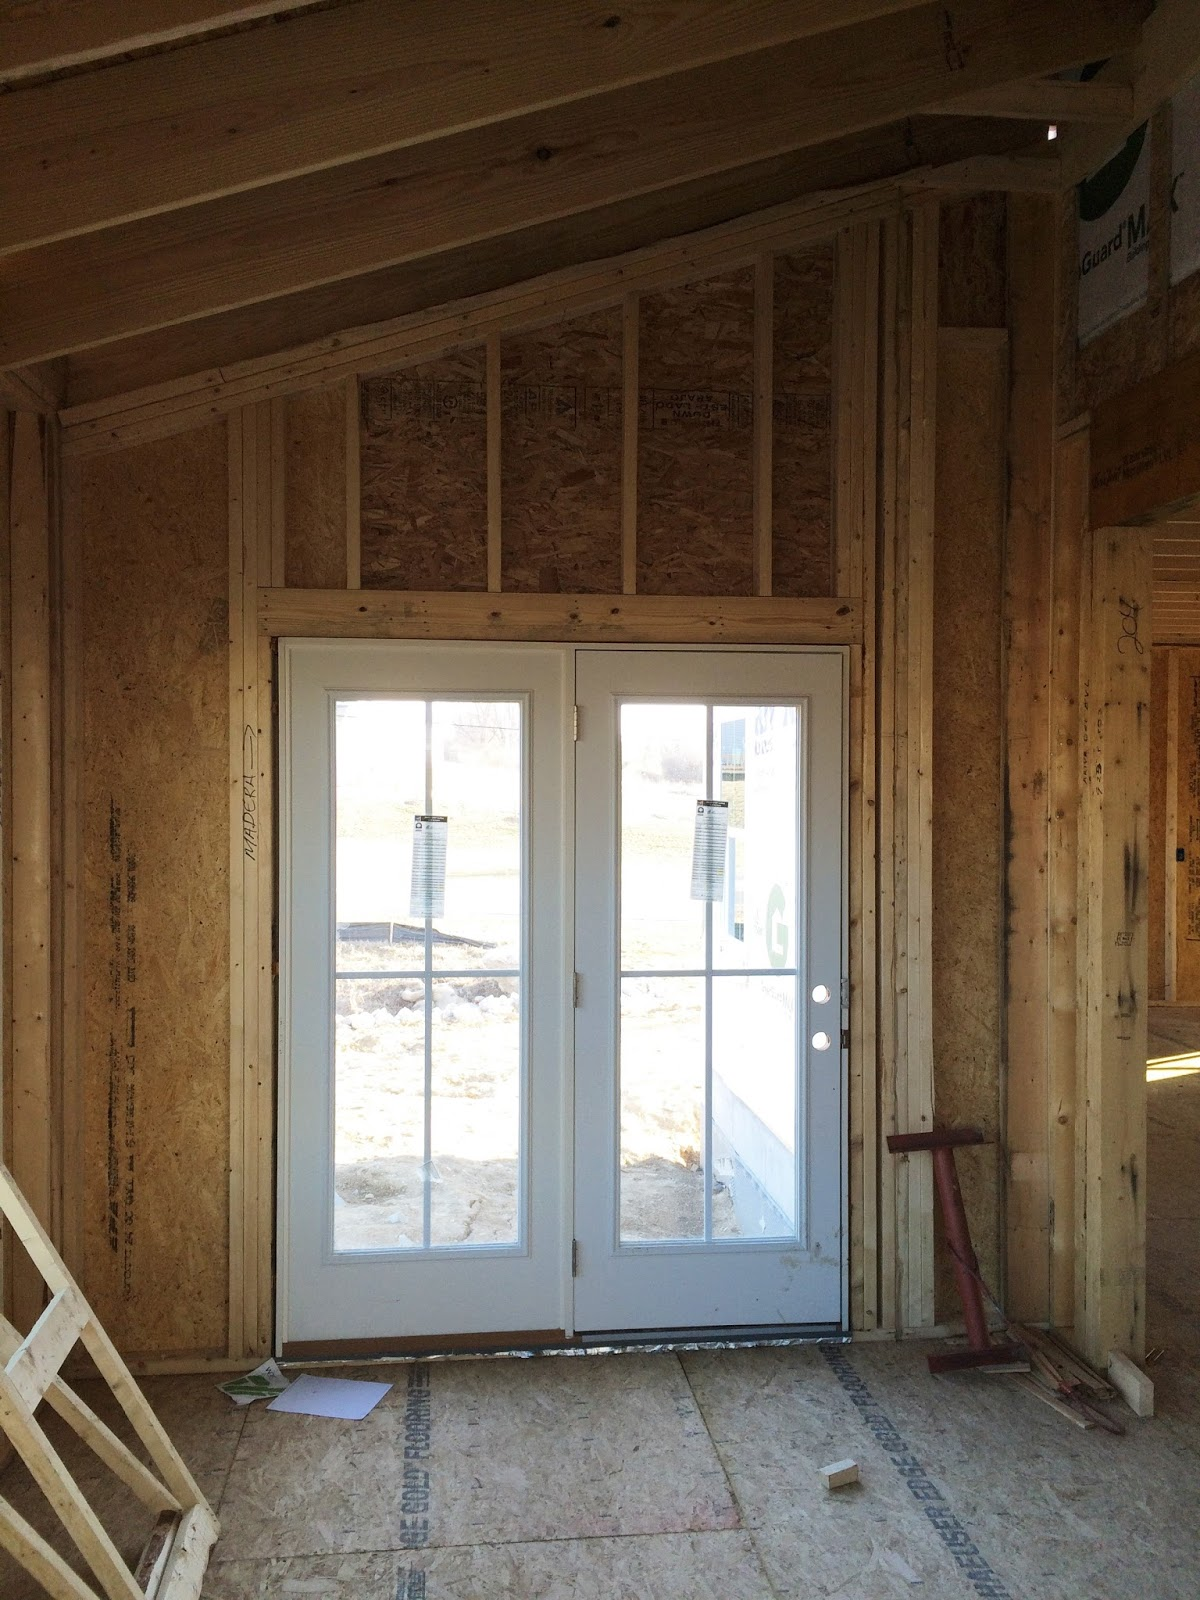 Lighting Basement Washroom Stairs: Ryan Homes Milan: New Home Construction Experience